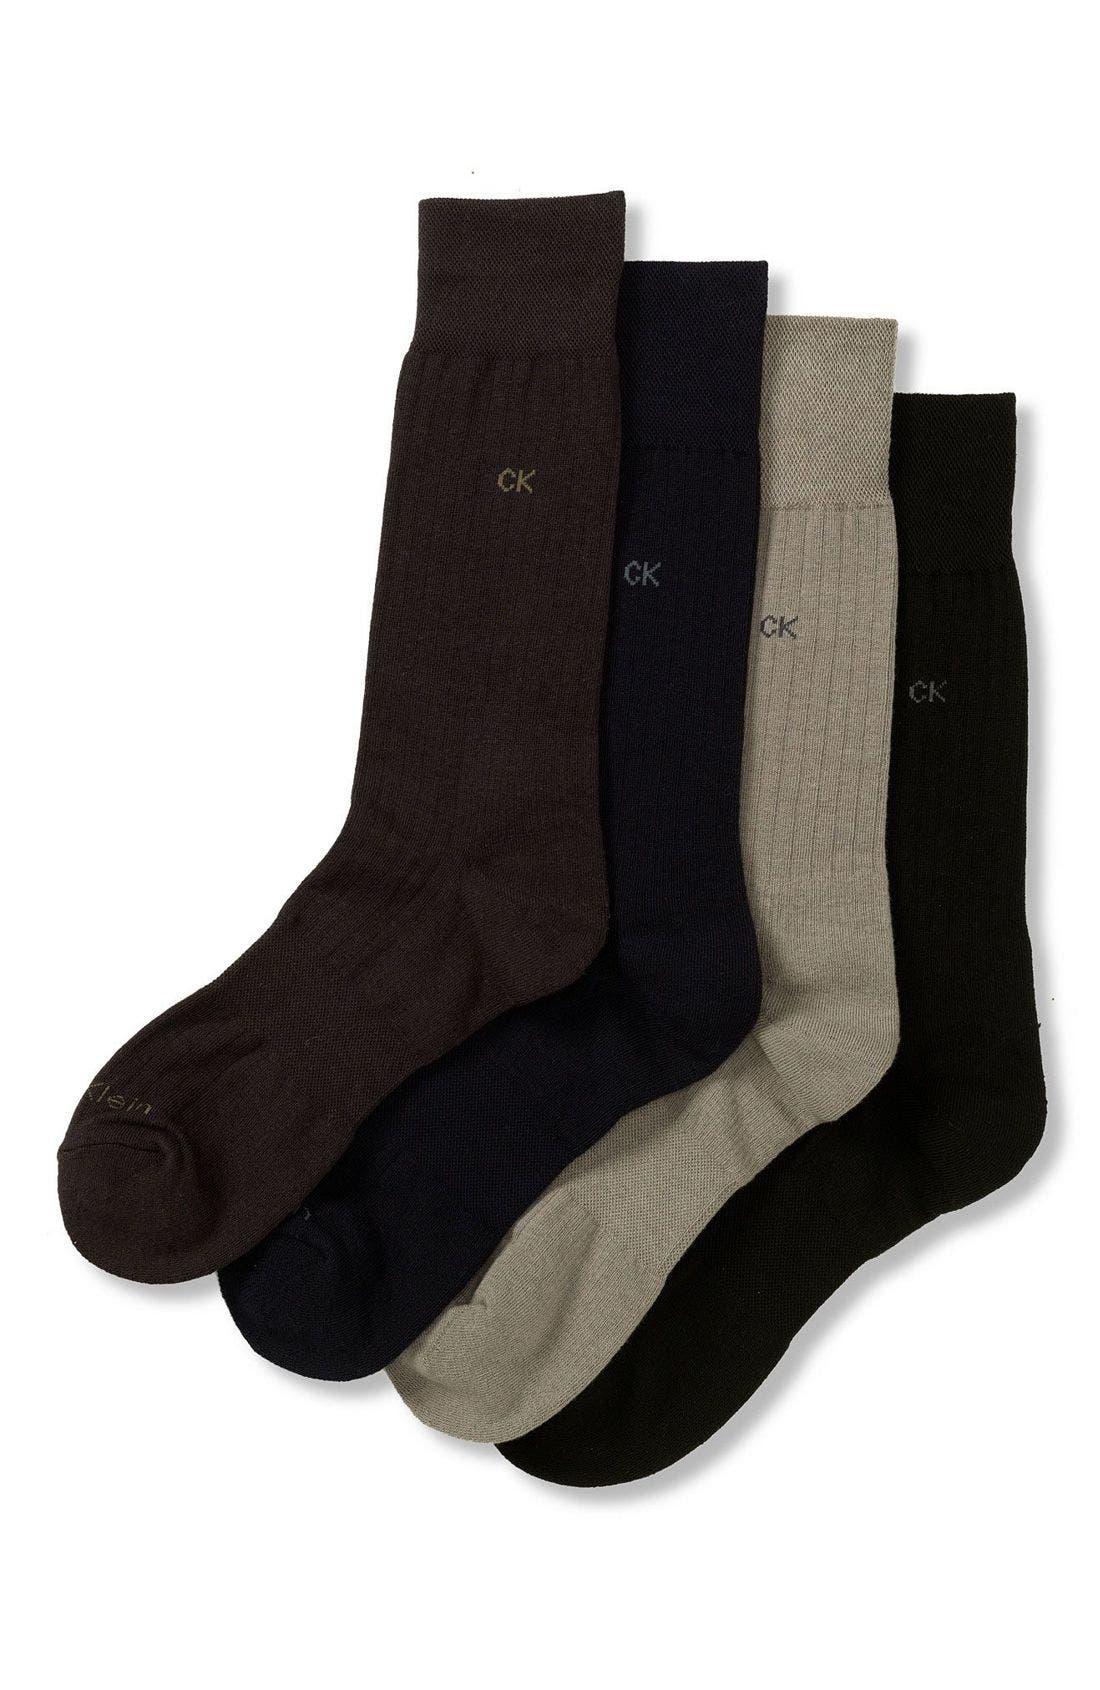 'Ultra Fit' Socks,                             Alternate thumbnail 3, color,                             001